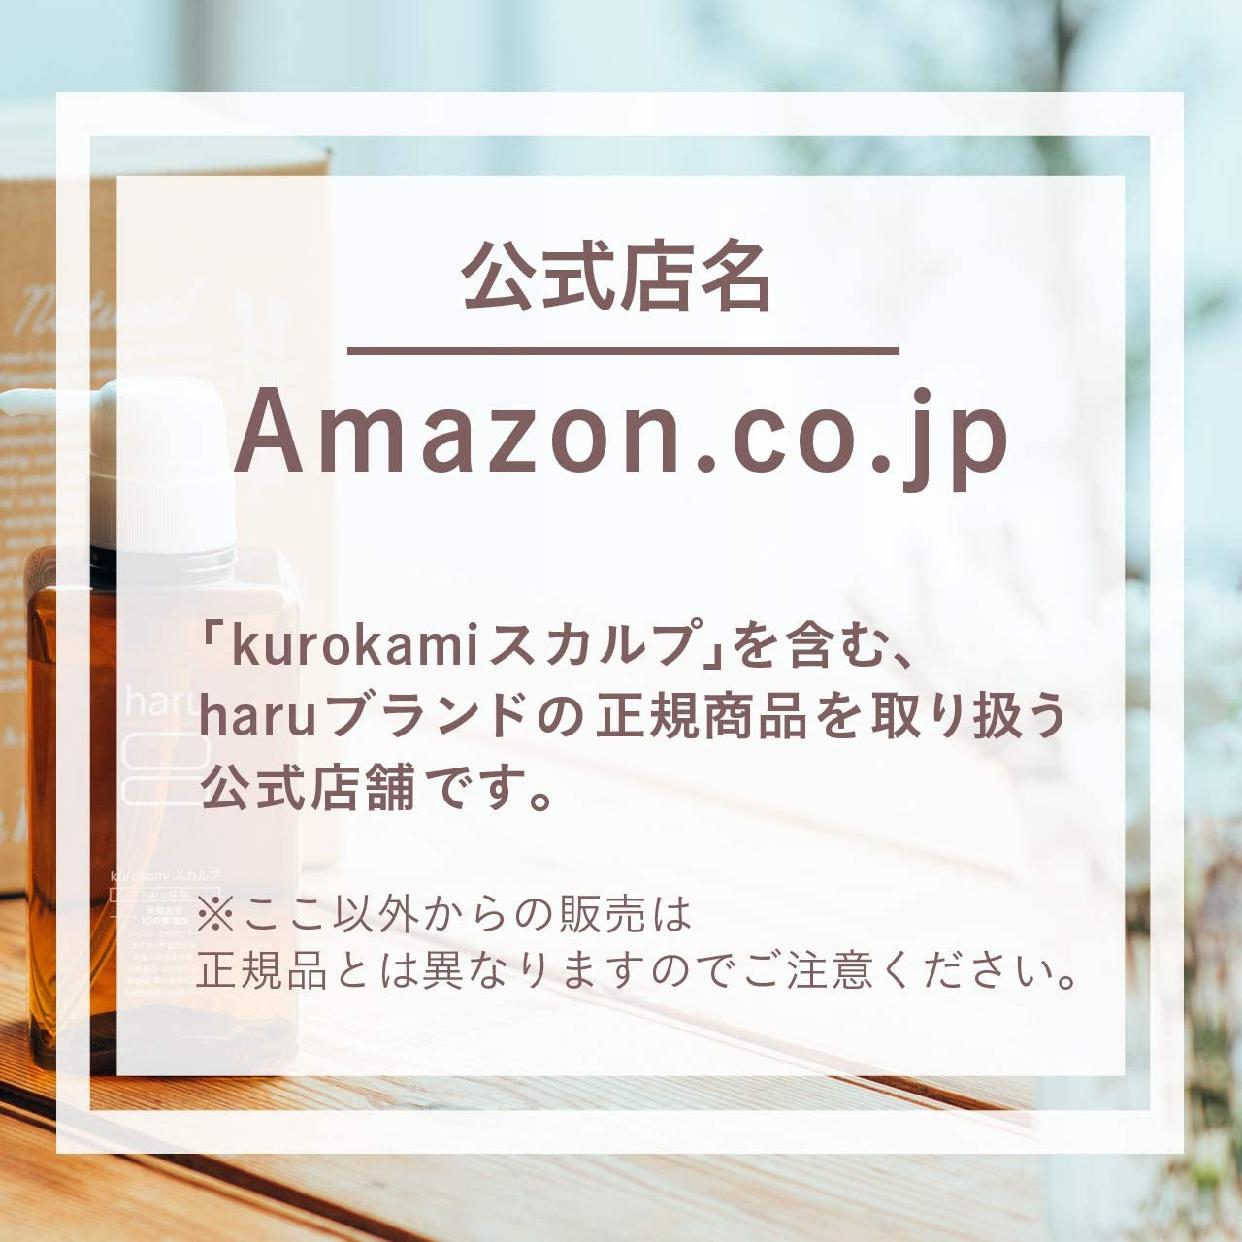 haru(ハル)kurokami スカルプの商品画像10